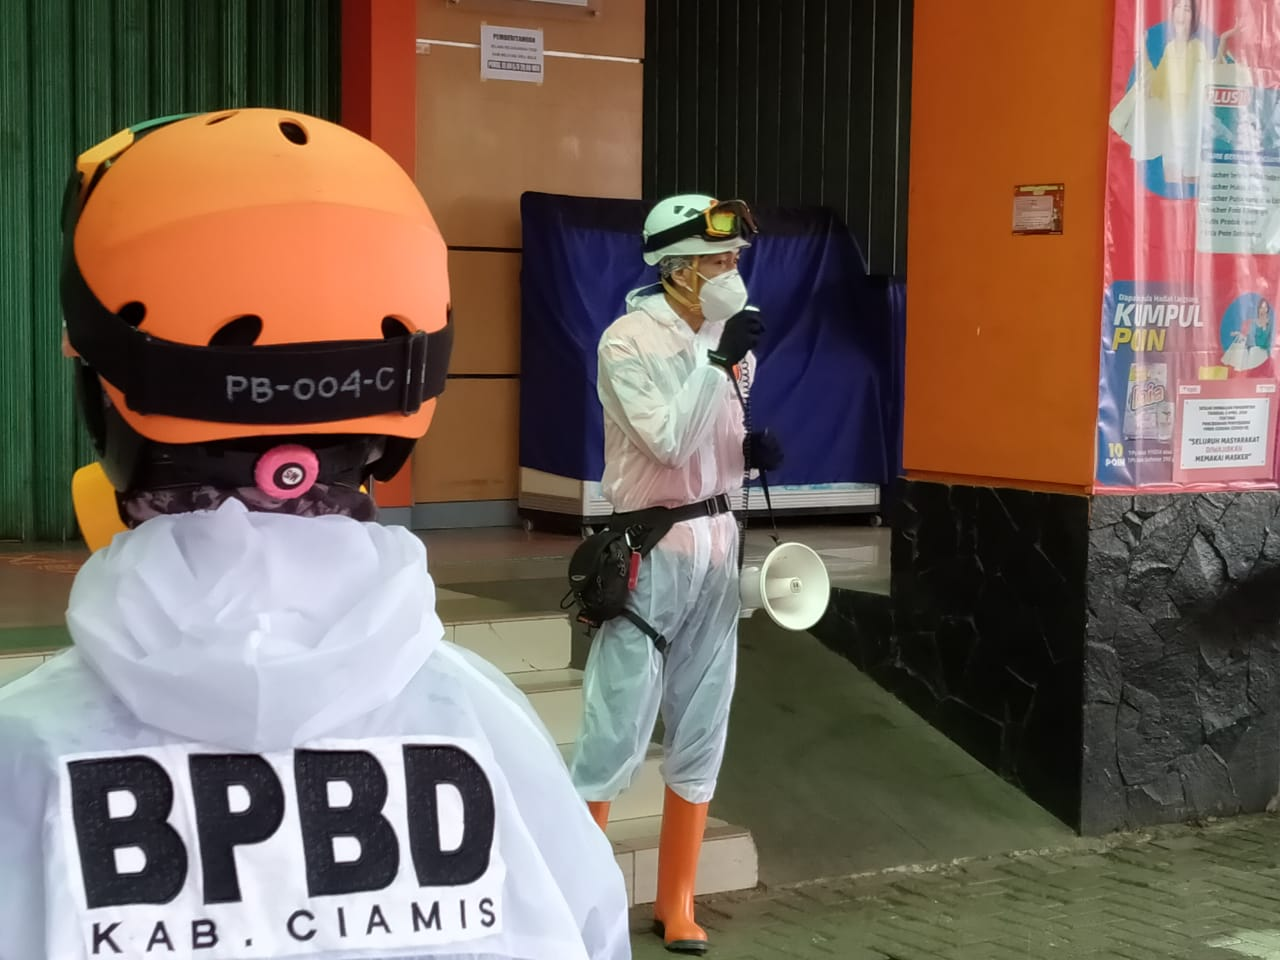 Pusat Perbelanjaan Toserba Yogya Ciamis, Semprot Disinfektan